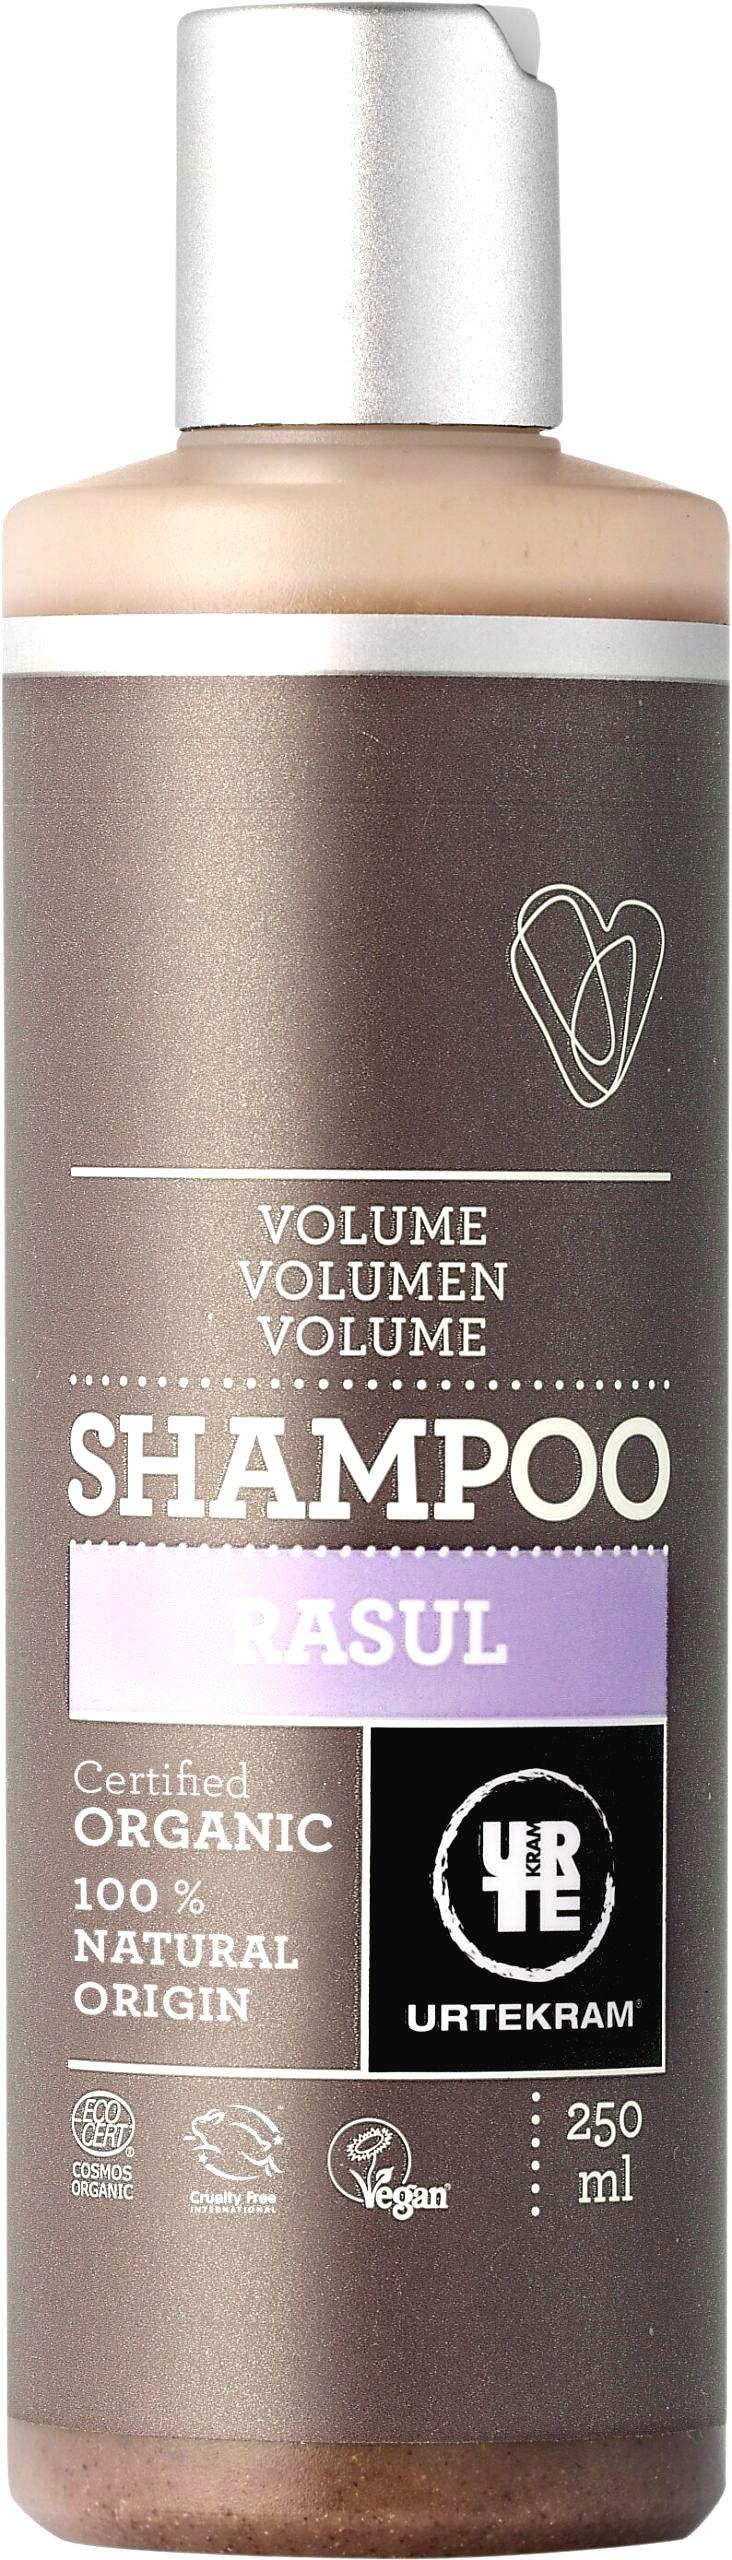 Urtekram Šampón rhassoul - na objem 250 ml BIO